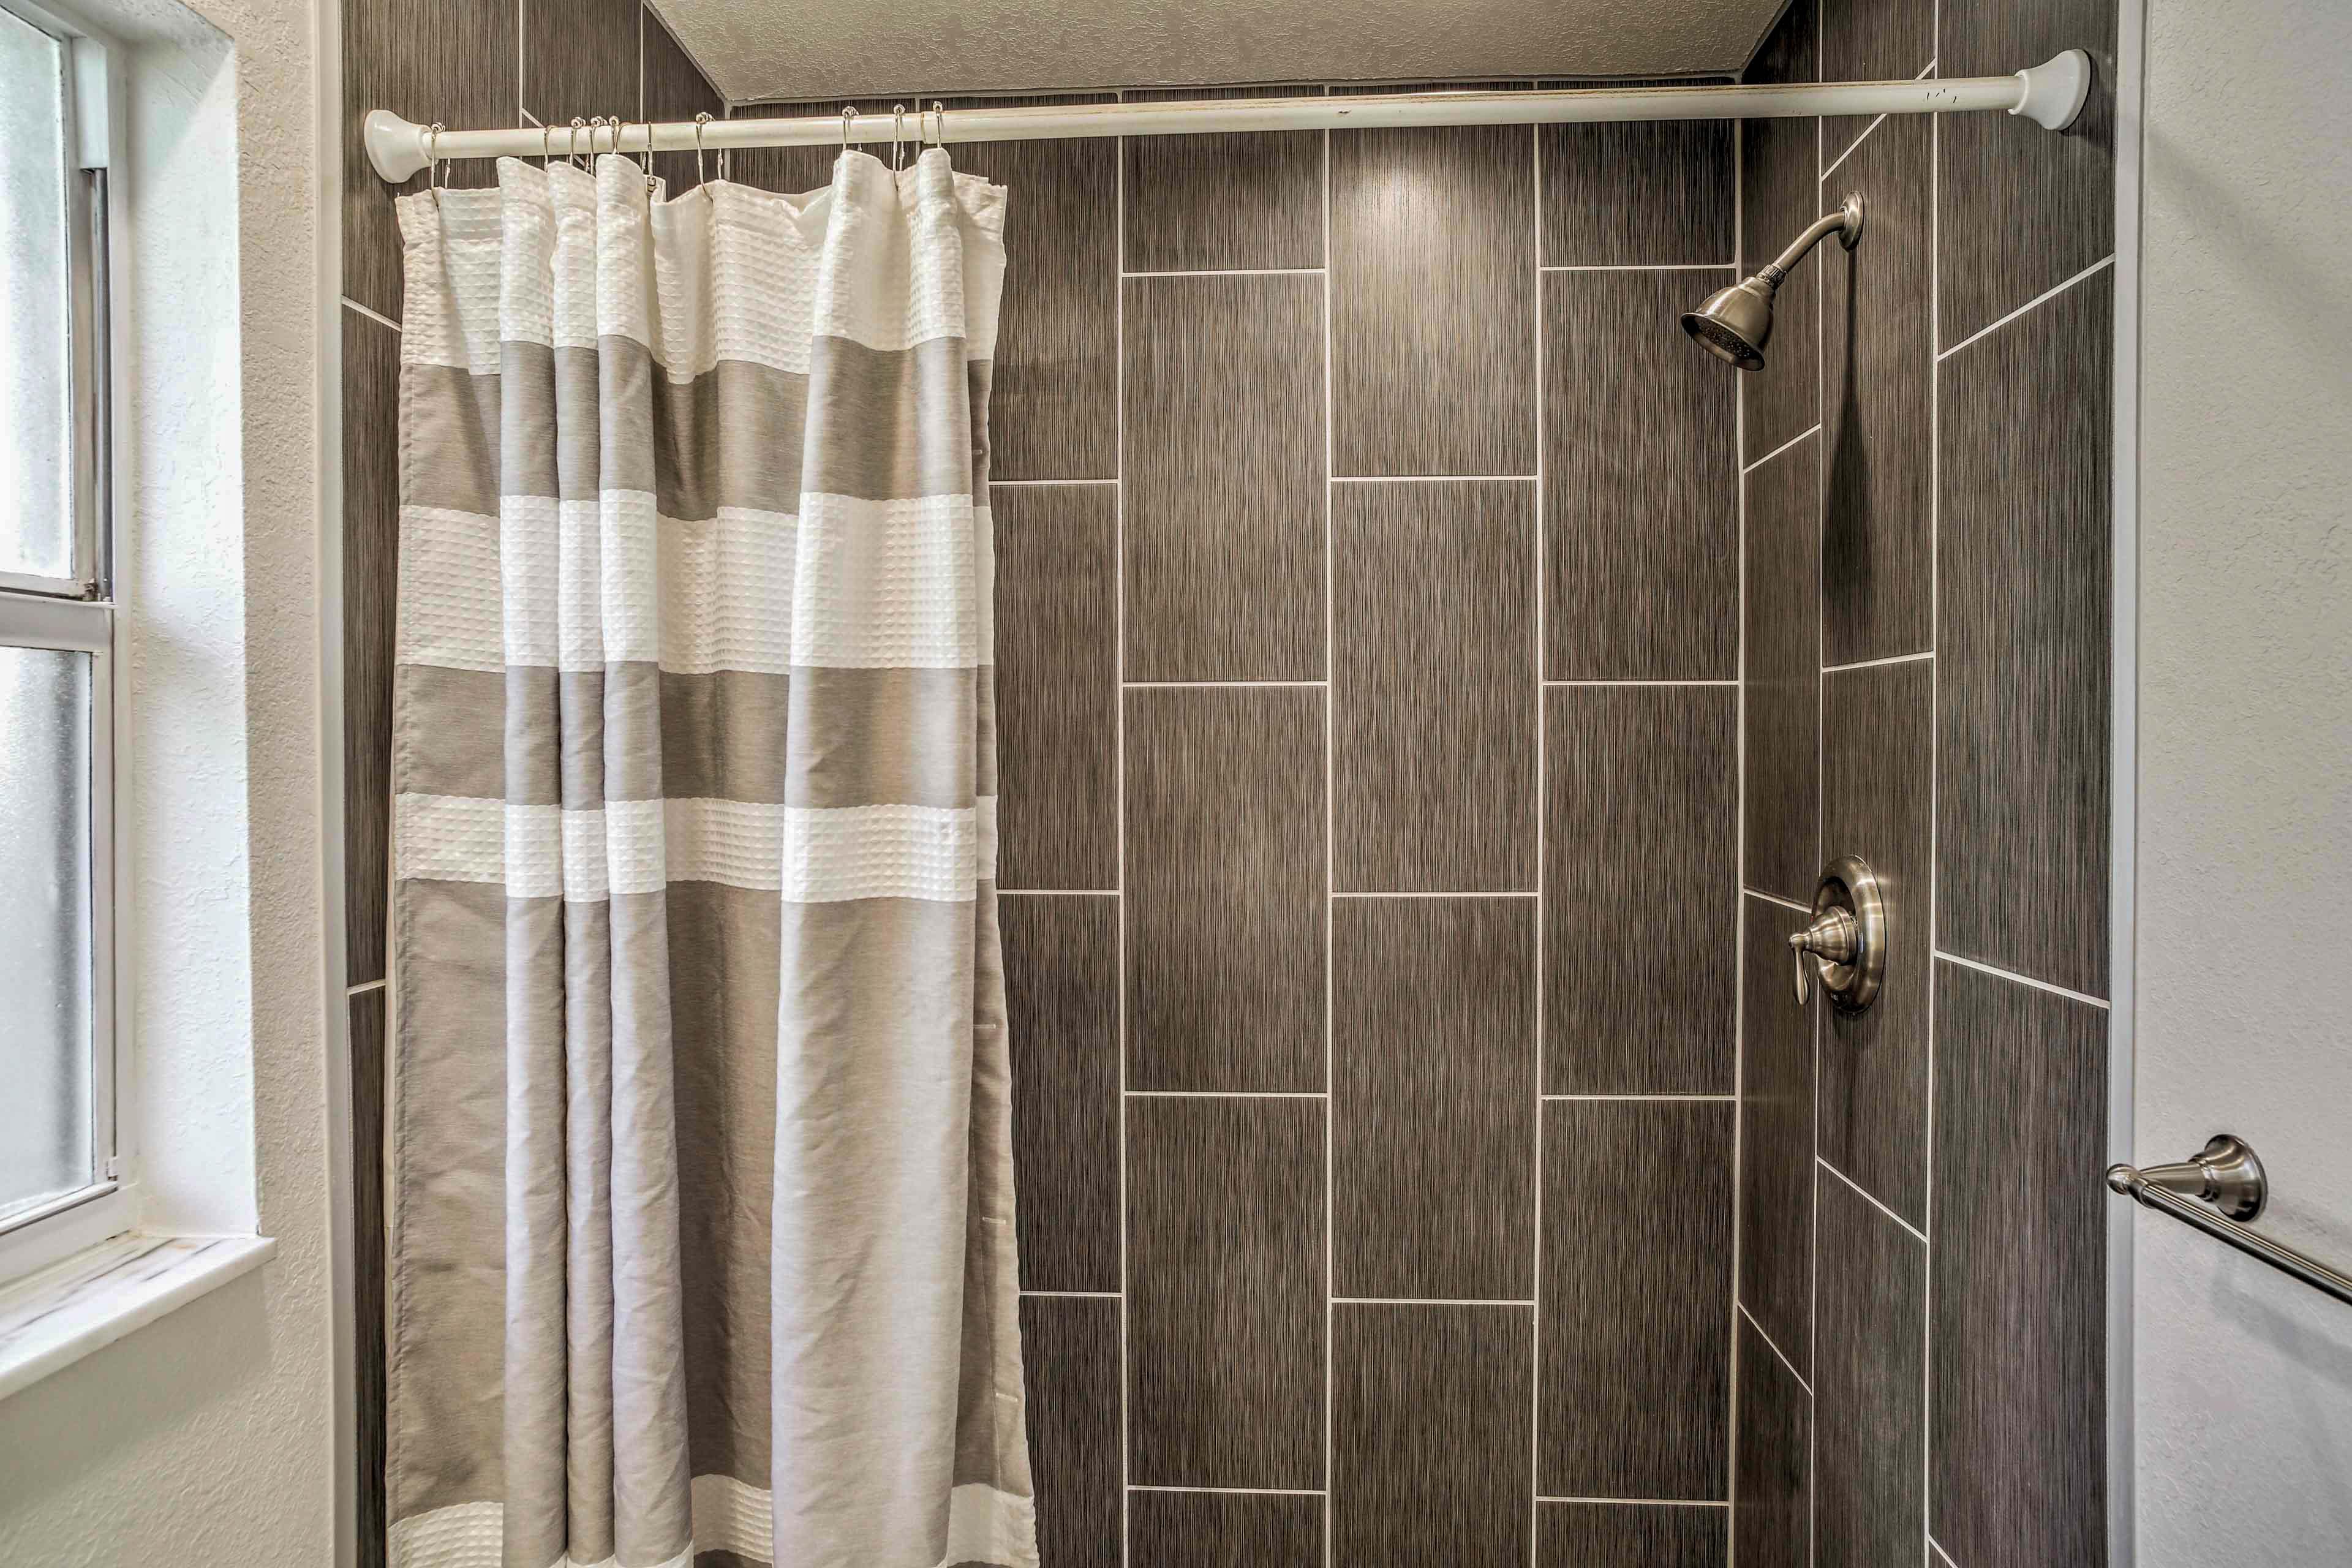 Wash up in the lavish walk-in shower.